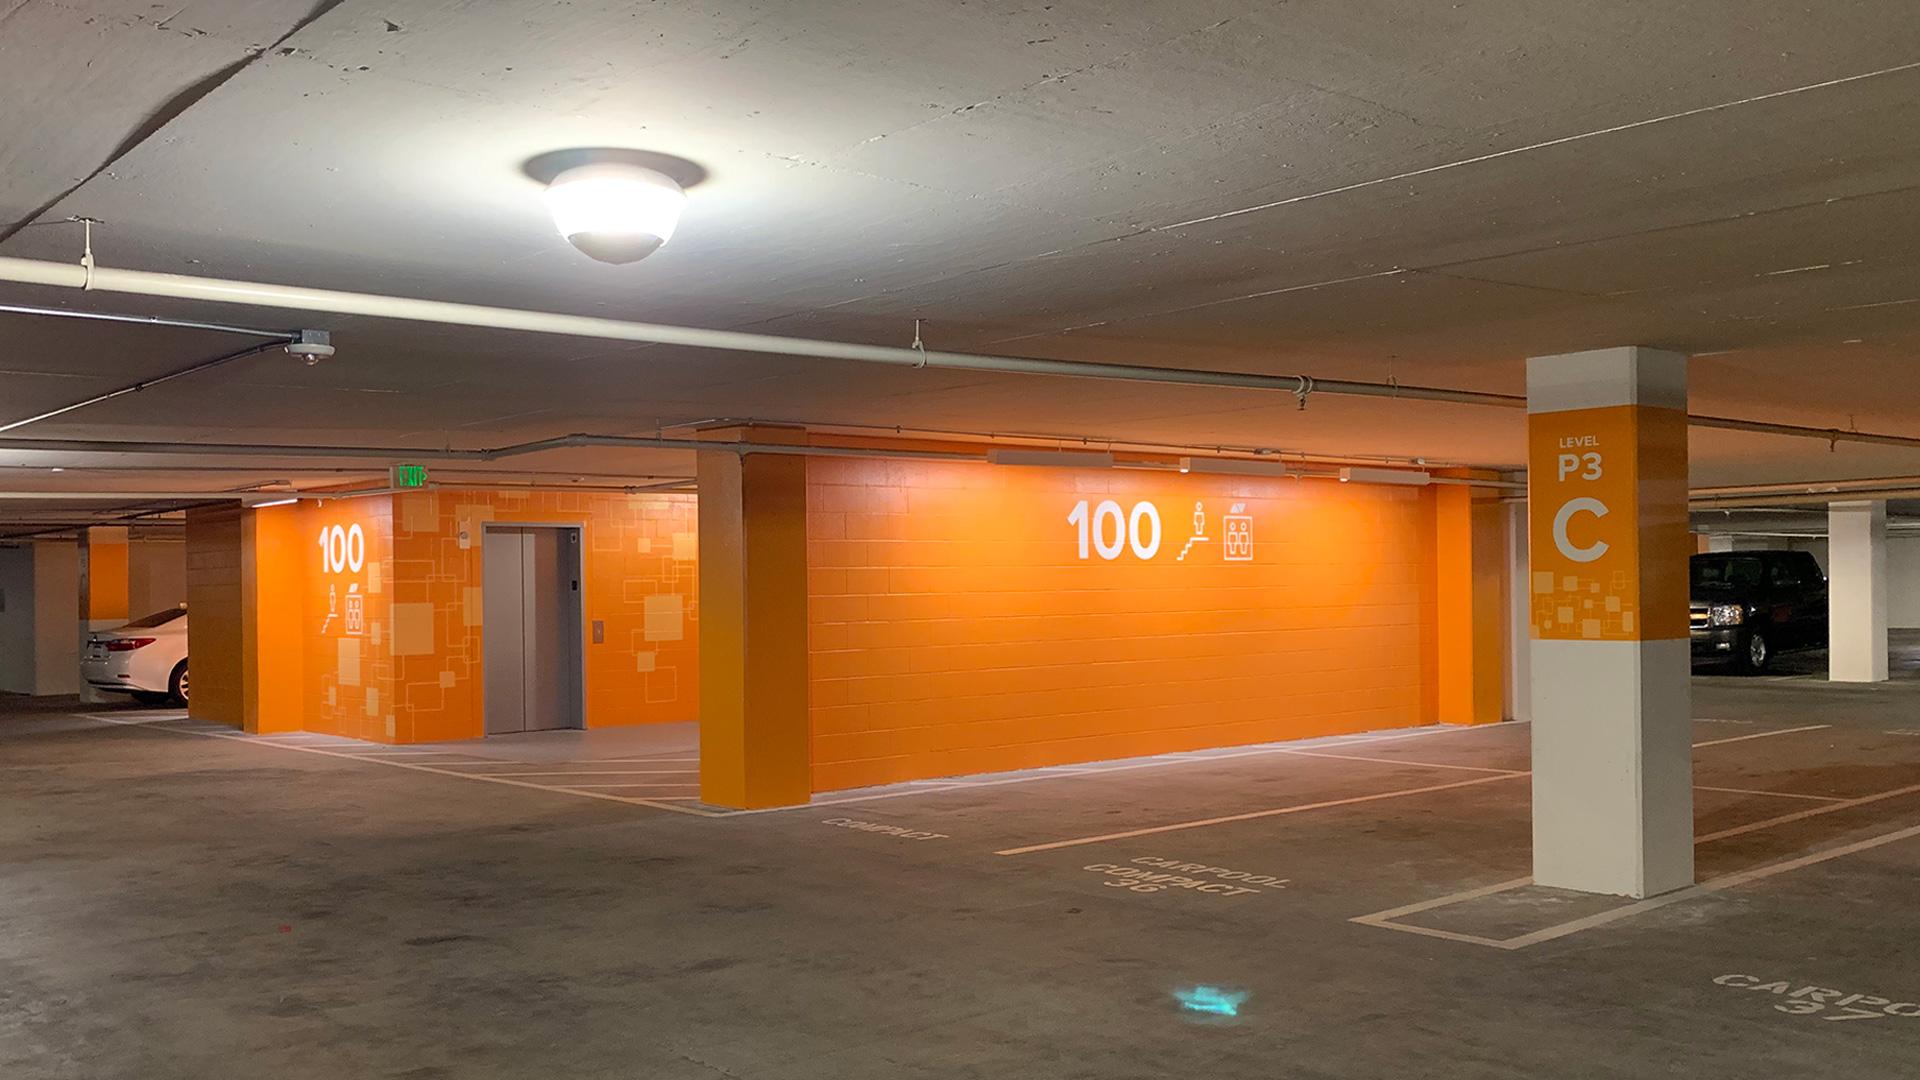 SCC_Parking_Level3_Bldg100_Lobby